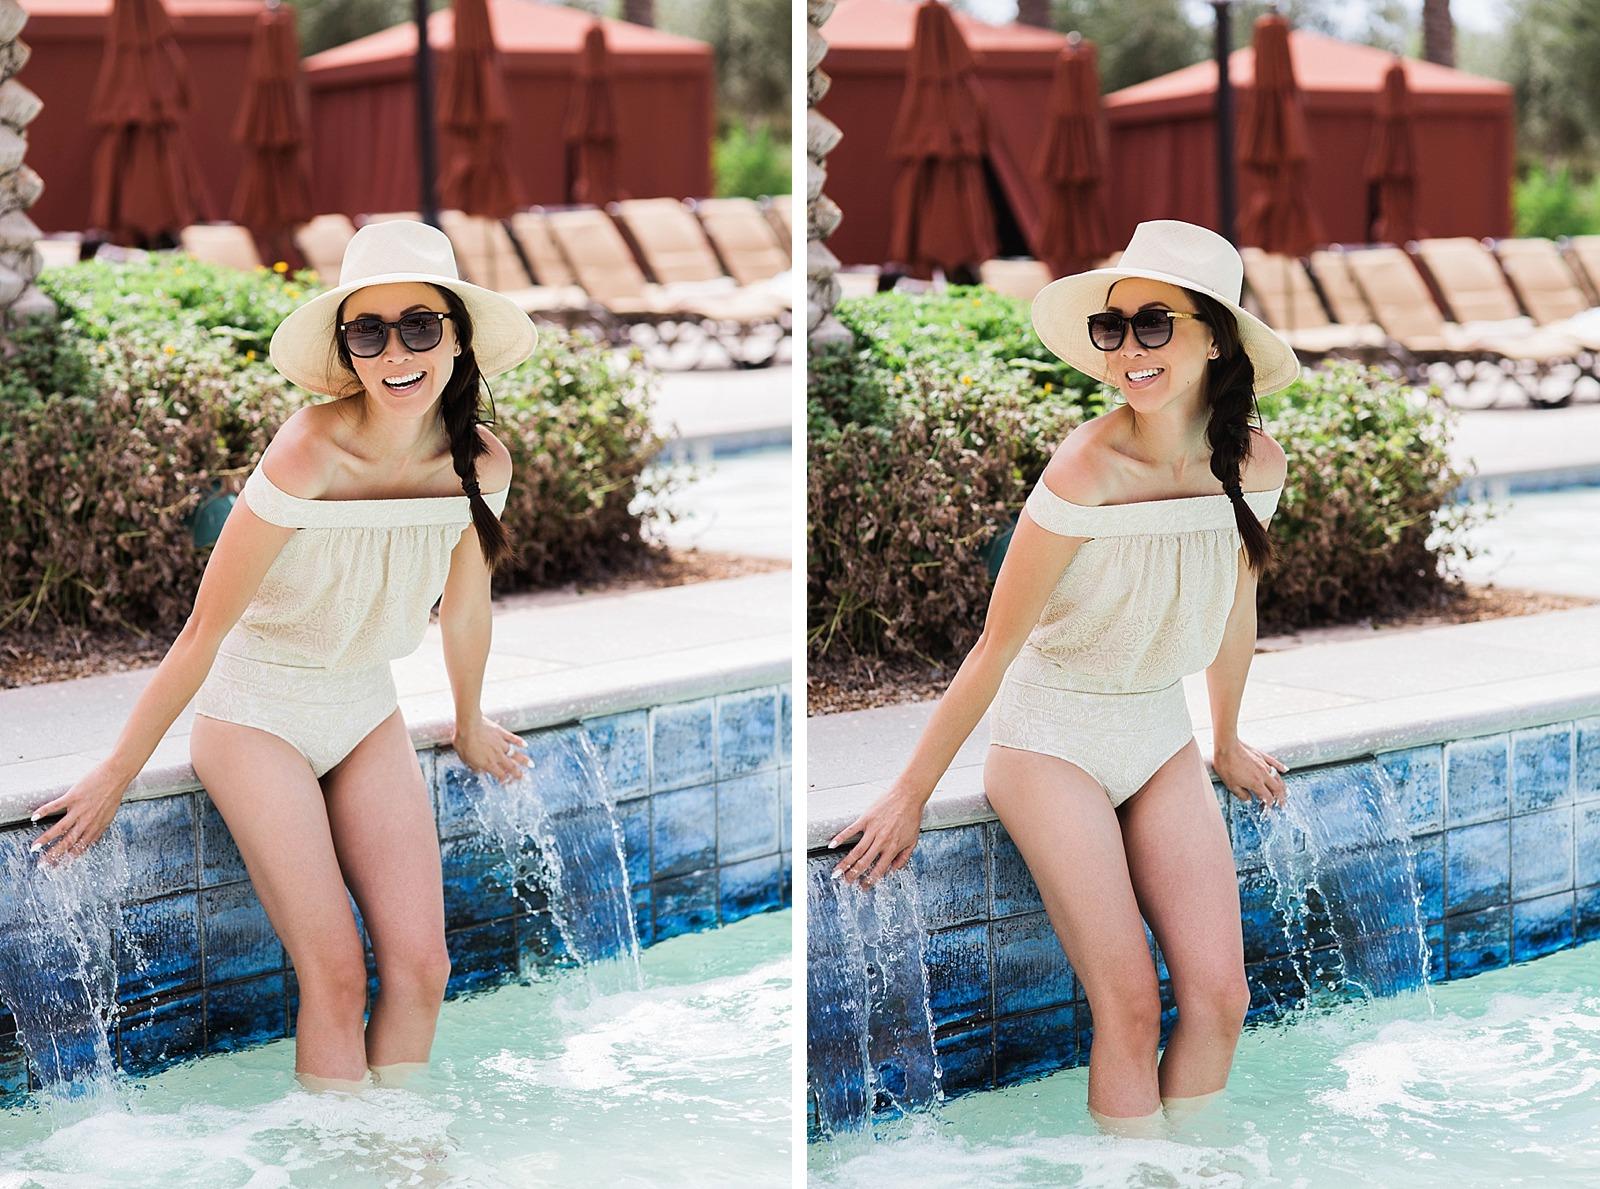 off-shoulder-bikini-riot-swimsuit-casino-del-sol-diana-elizabeth-blog-lifestyle-blogger-style_0044